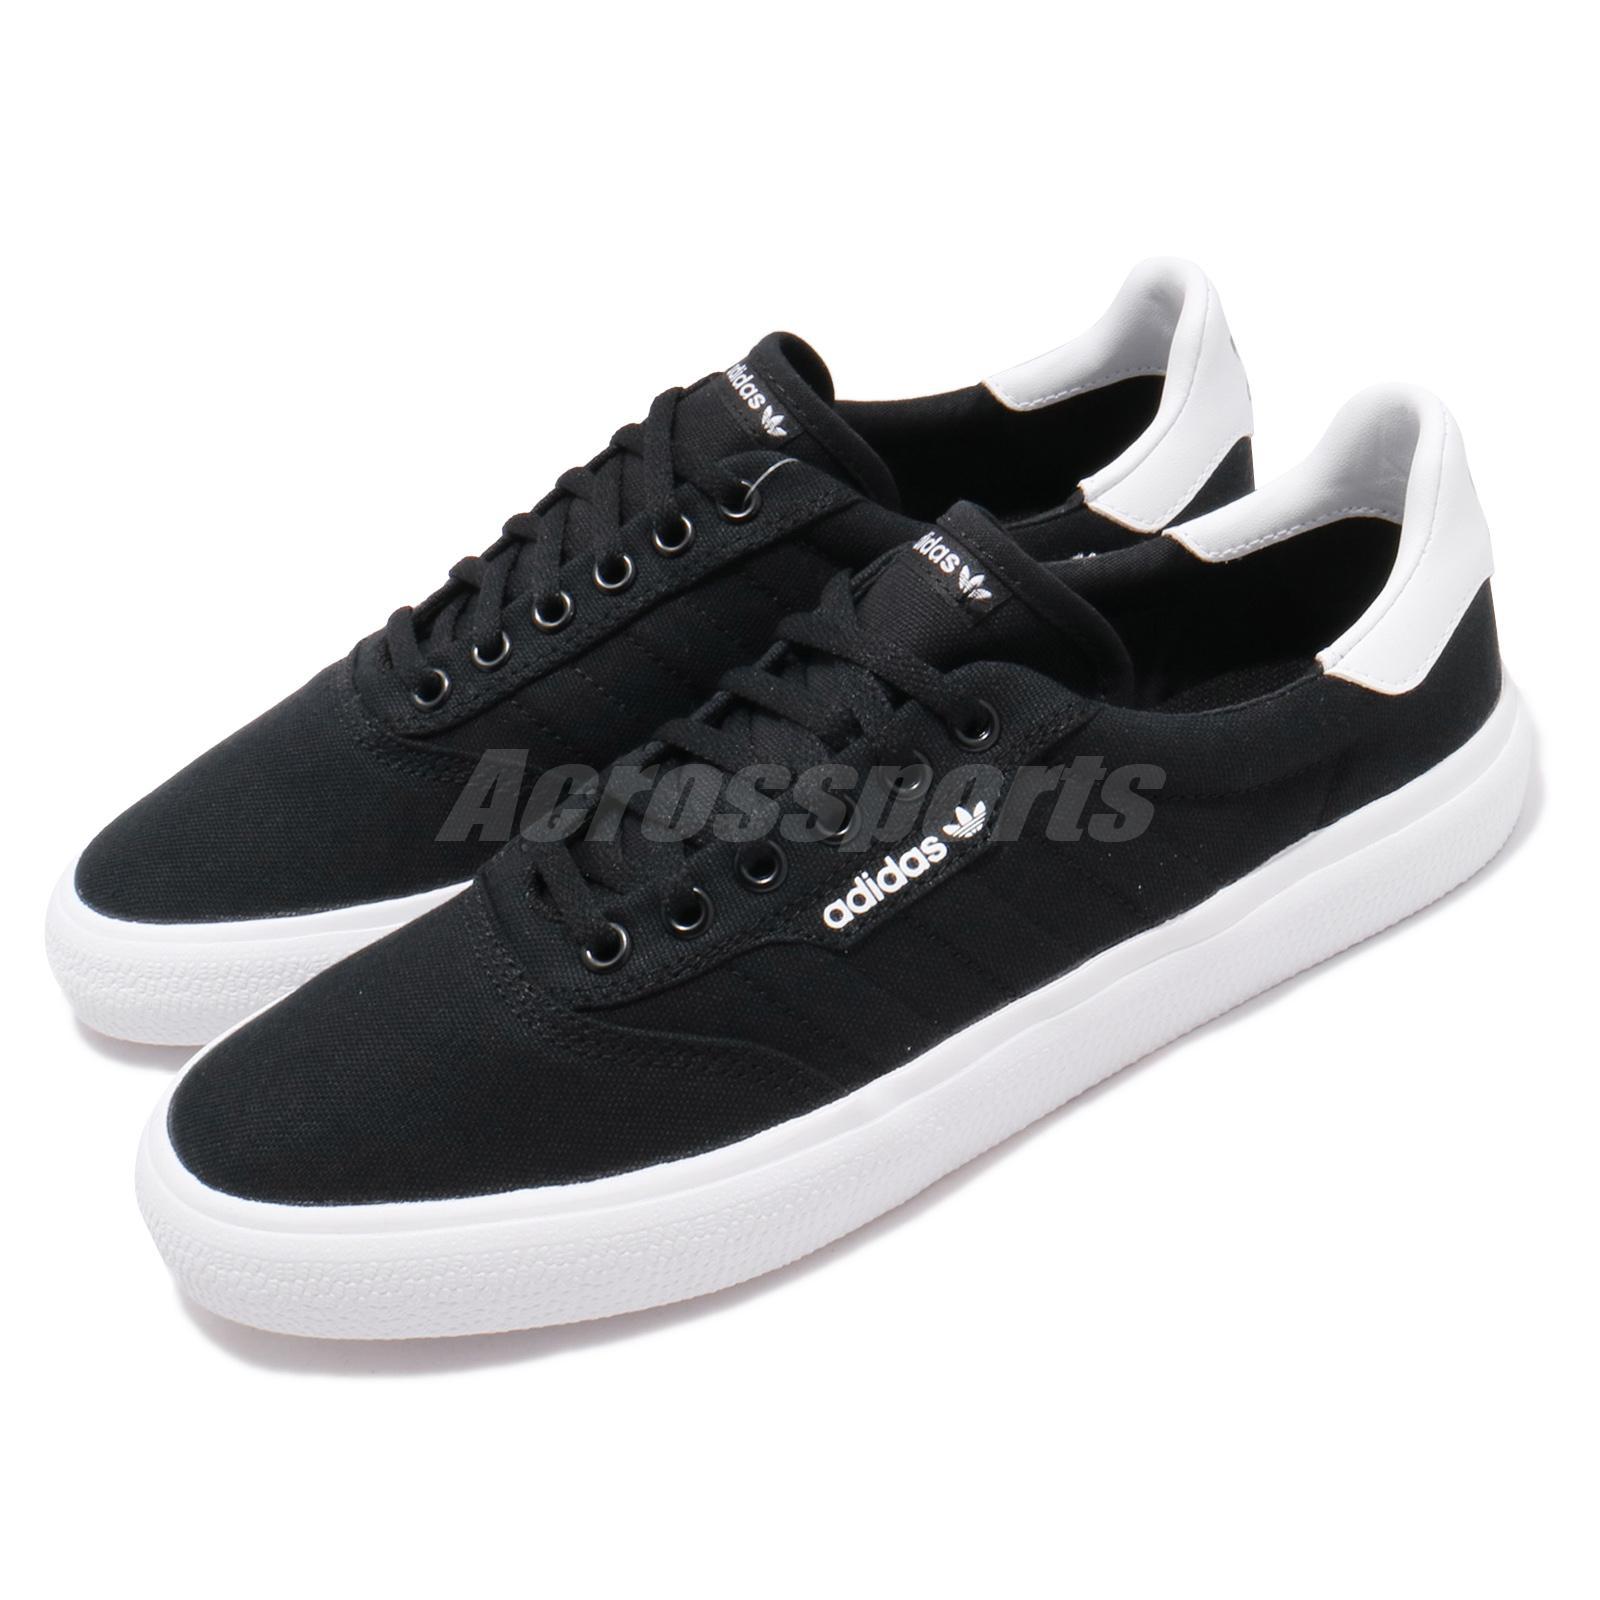 Details about adidas Originals 3MC Black White Men Casual Lifestyle Shoes Sneakers B22706